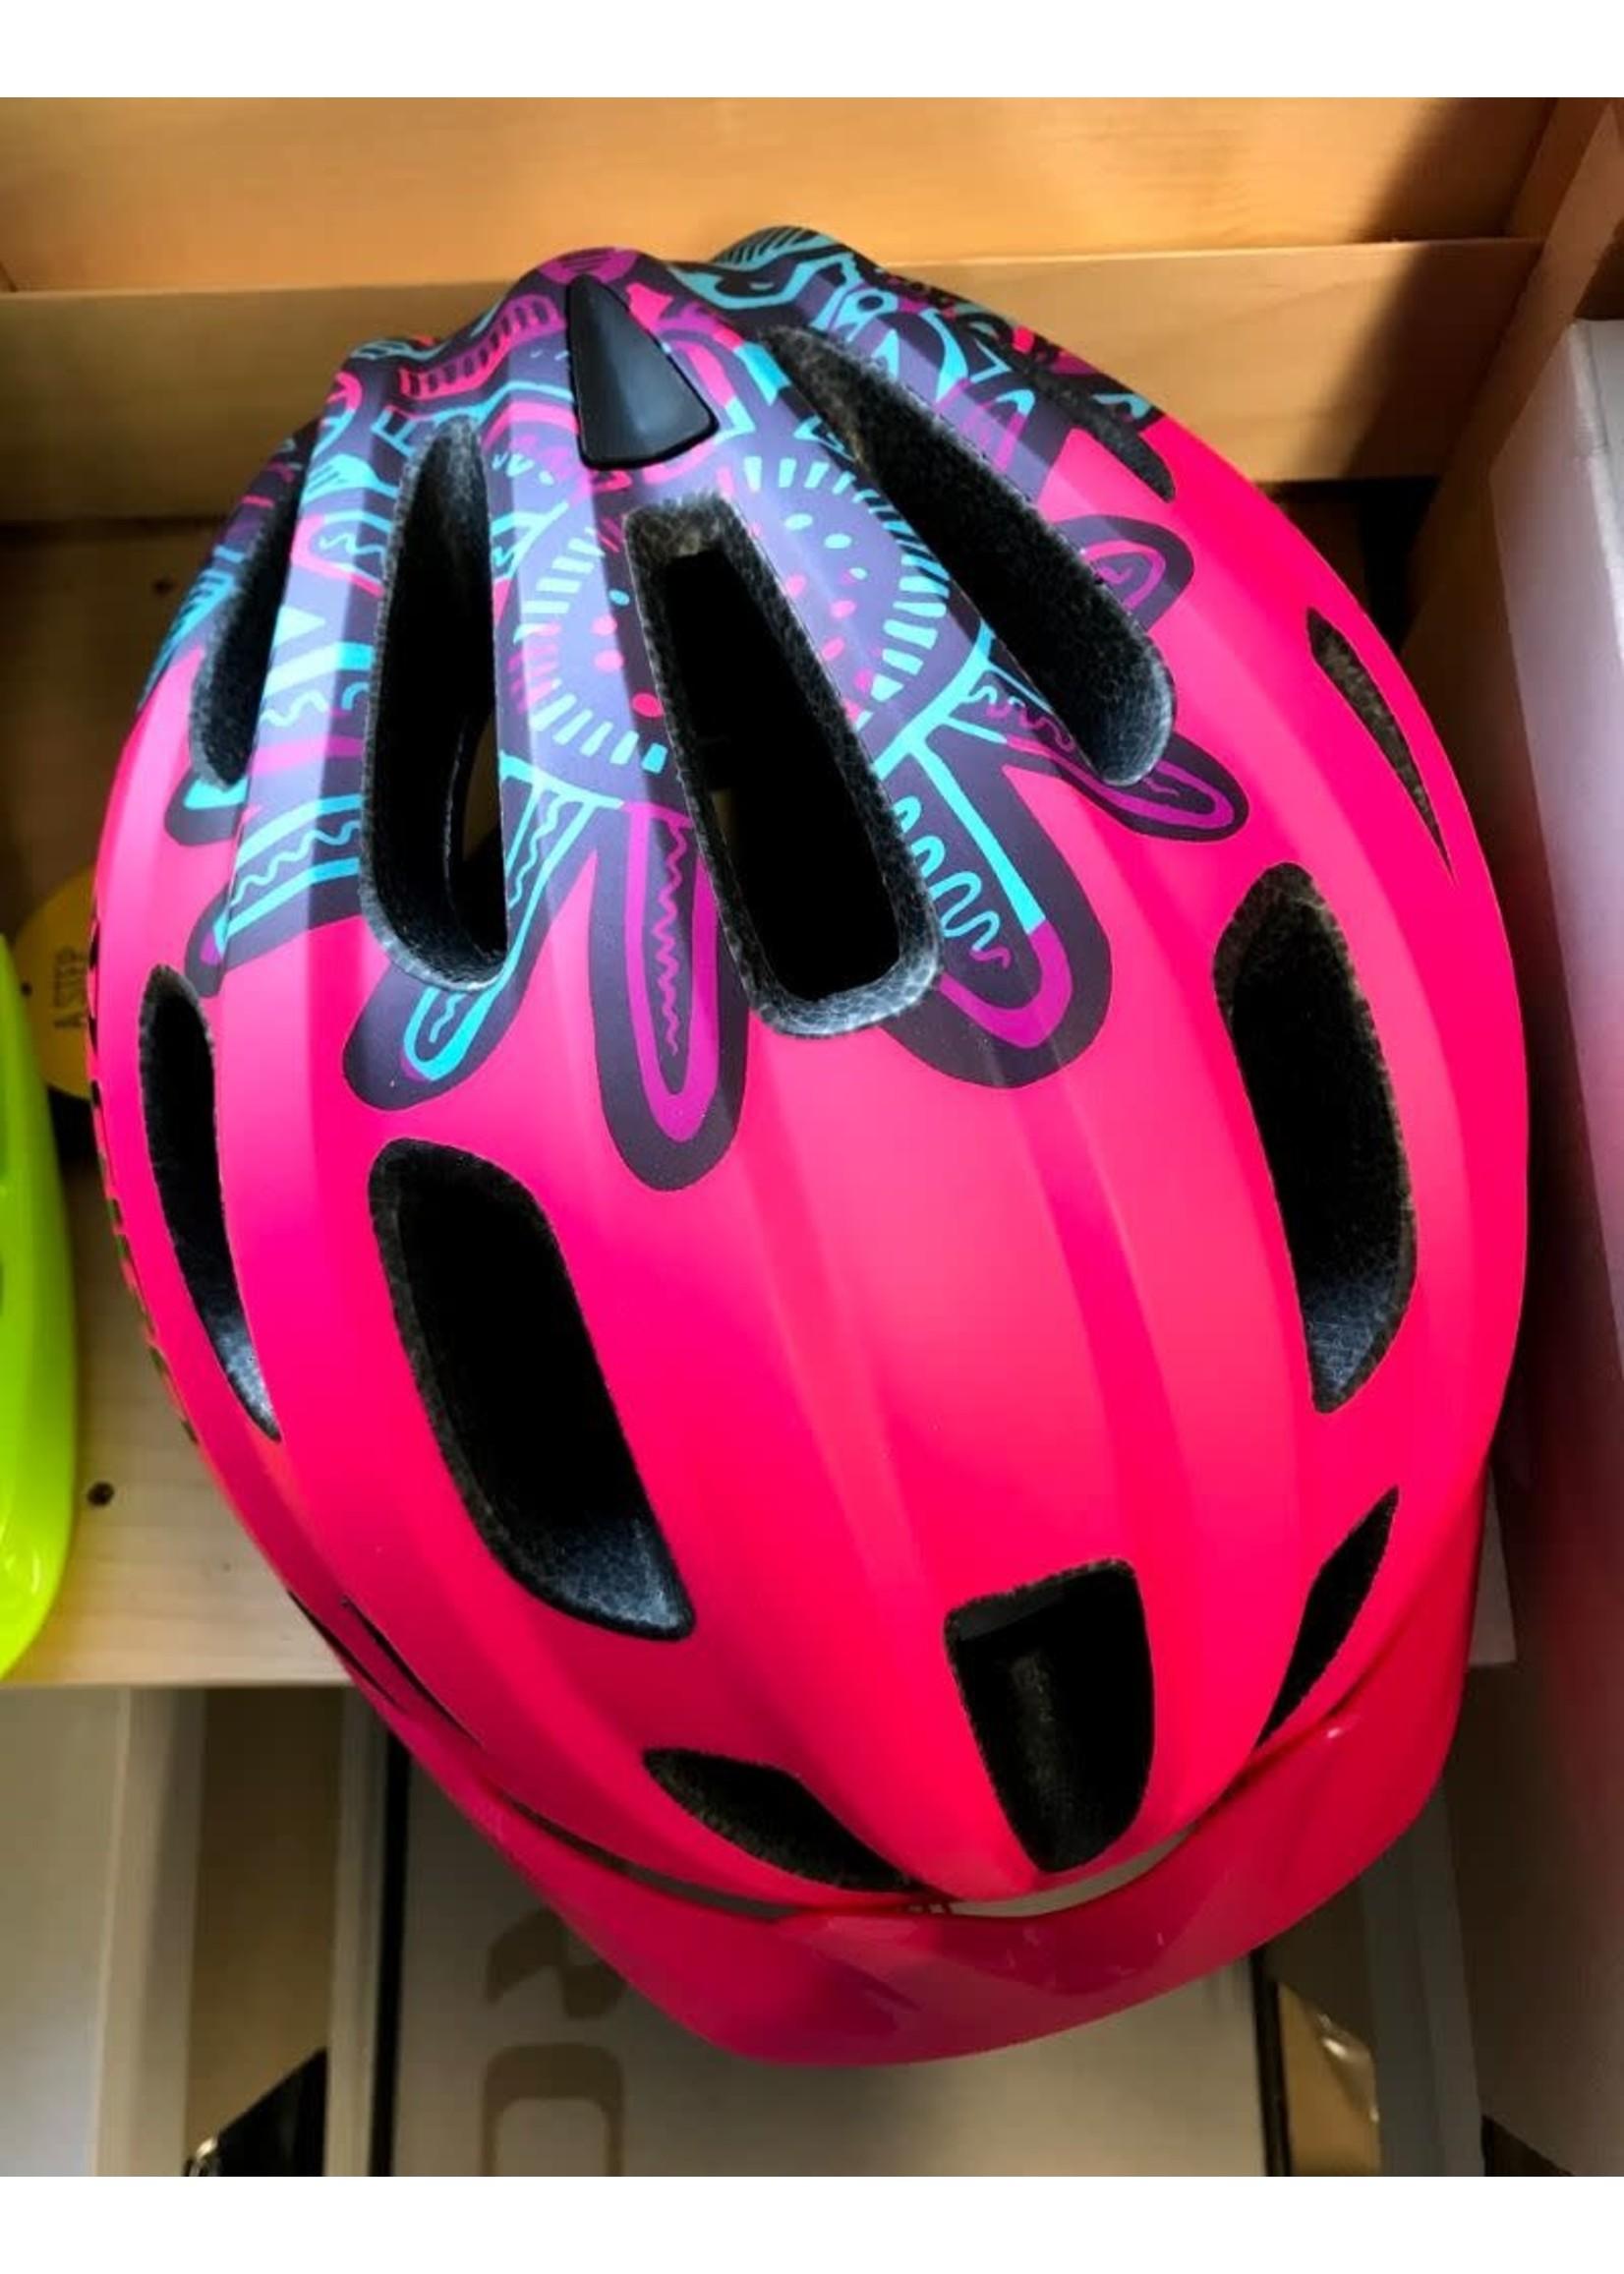 Giro Cycling Giro Cycling Hale MIPS Youth Helmet - Matte Bright Pink (Size UY)